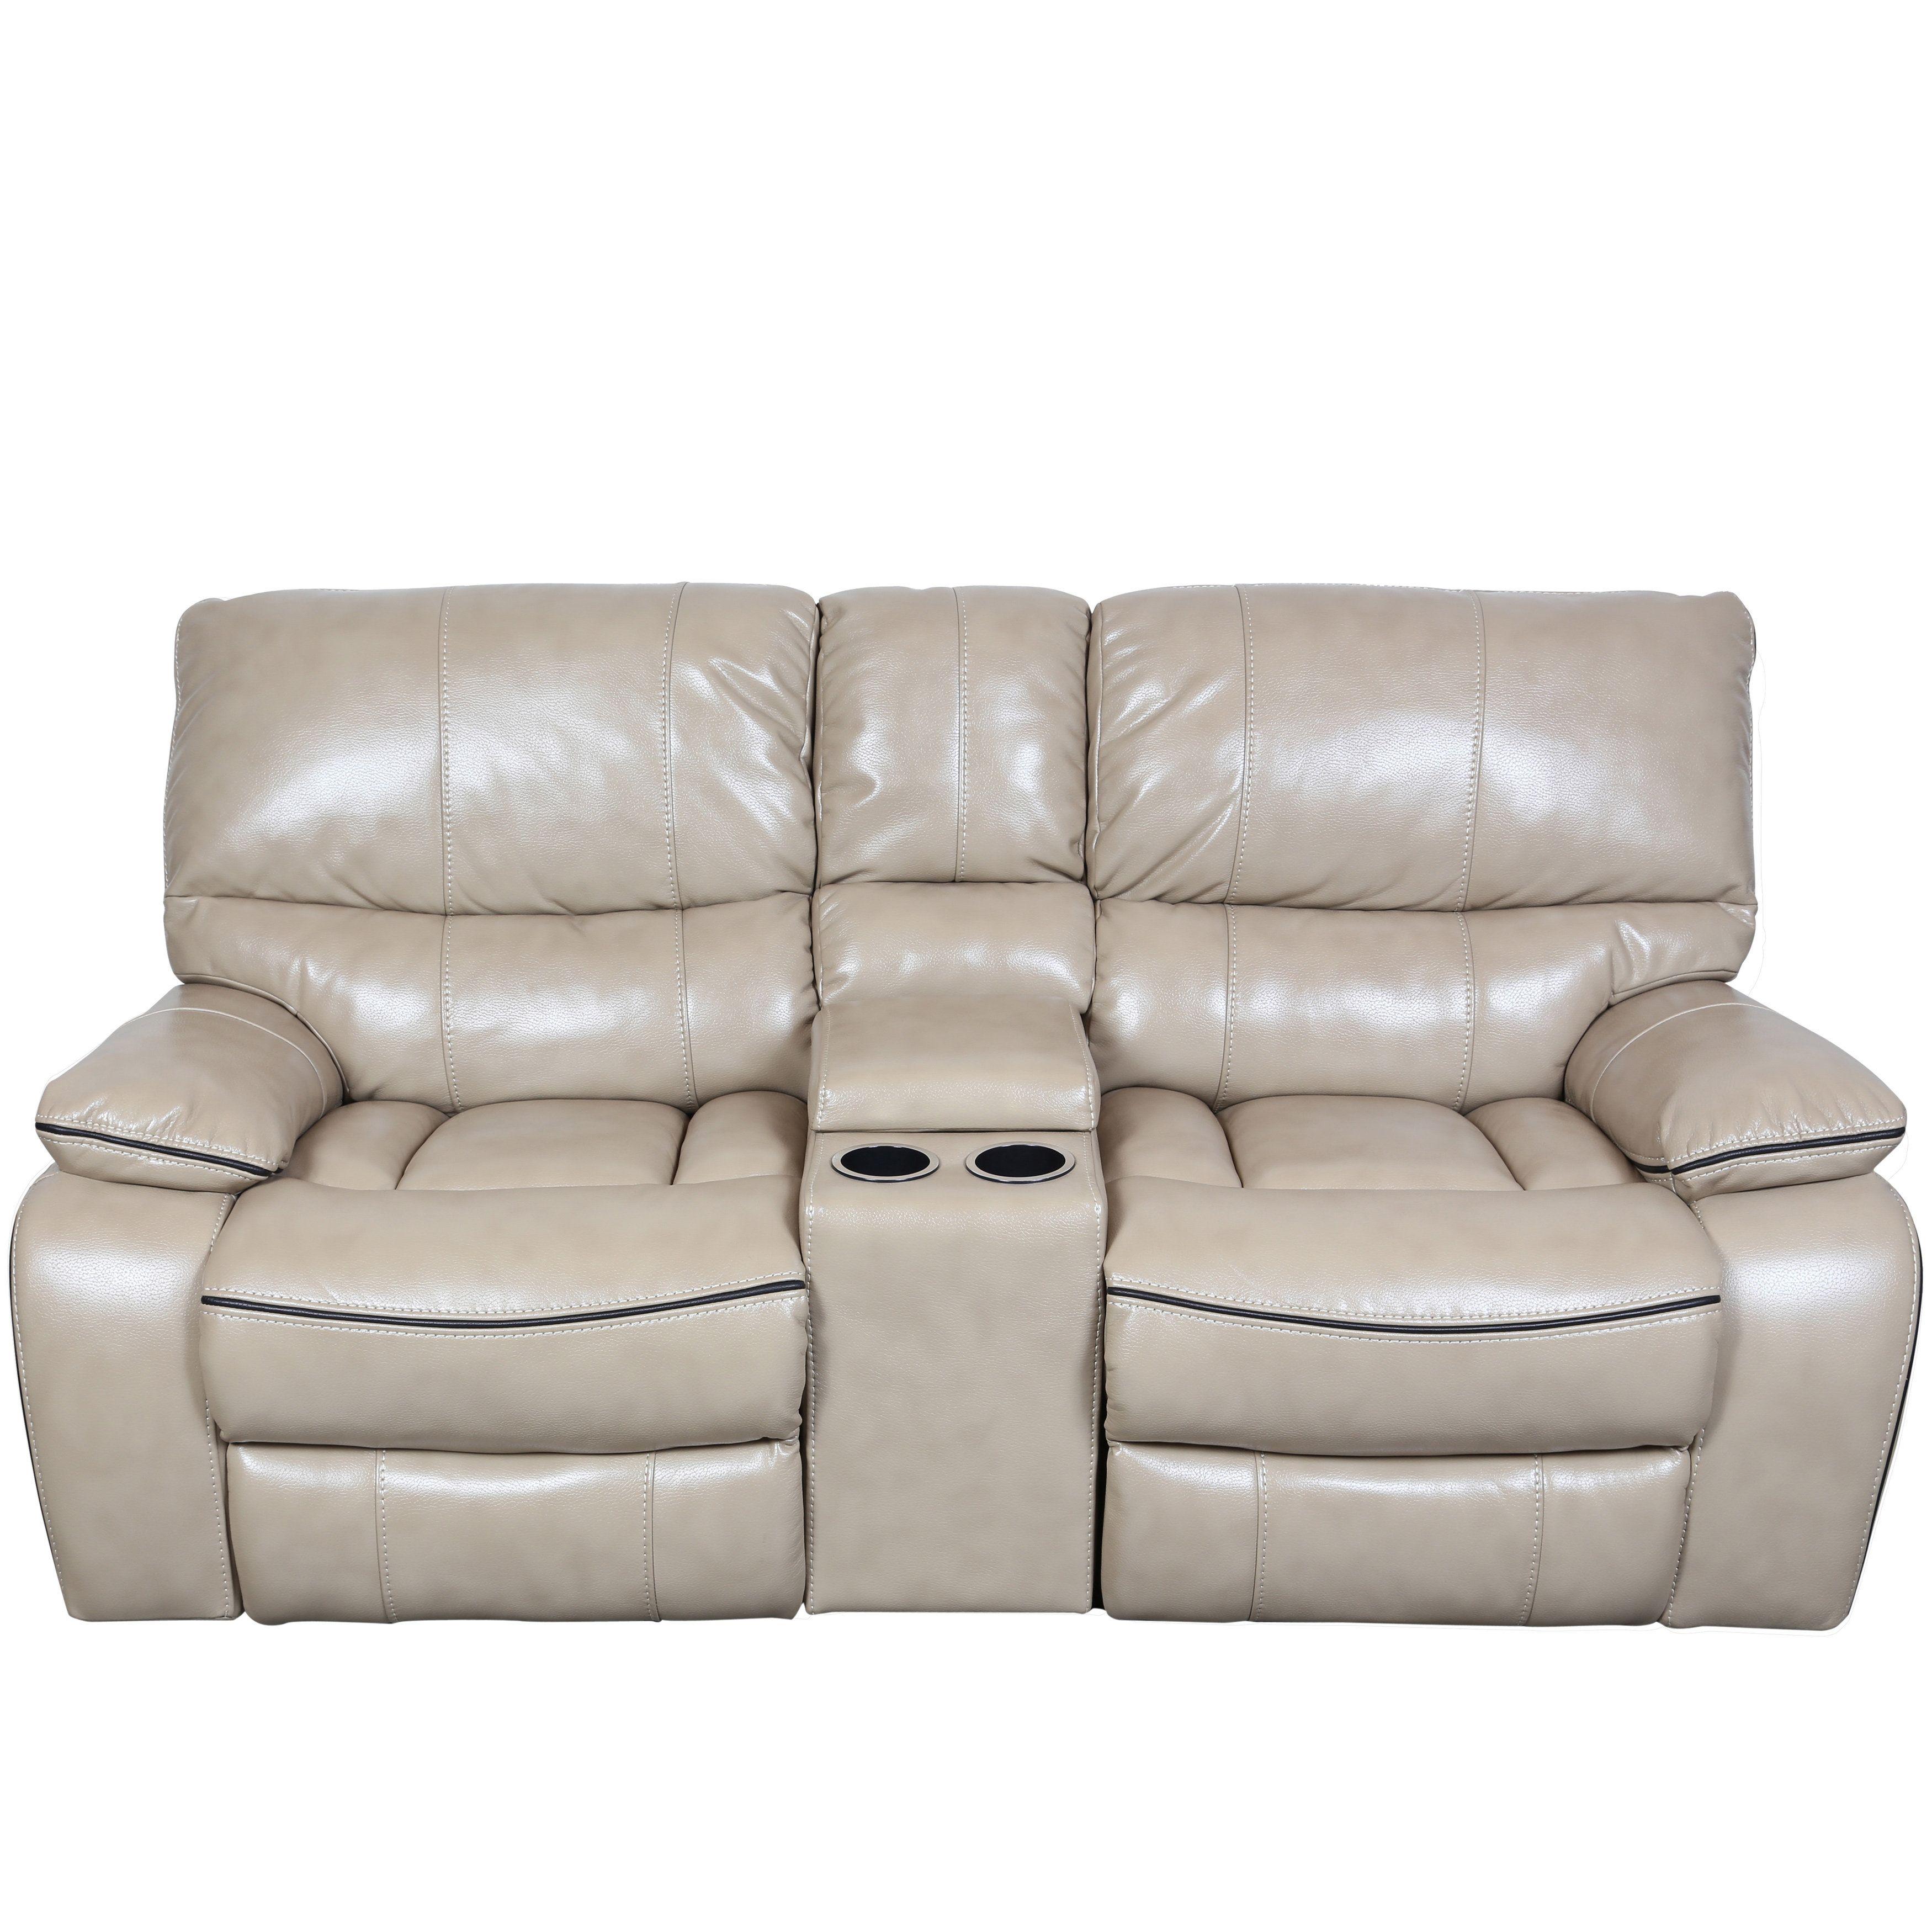 Porter Alameda Cream Vegan Leather Like Dual Reclining Console Loveseat With Contrast Welt Sofa Best Sofa Love Seat